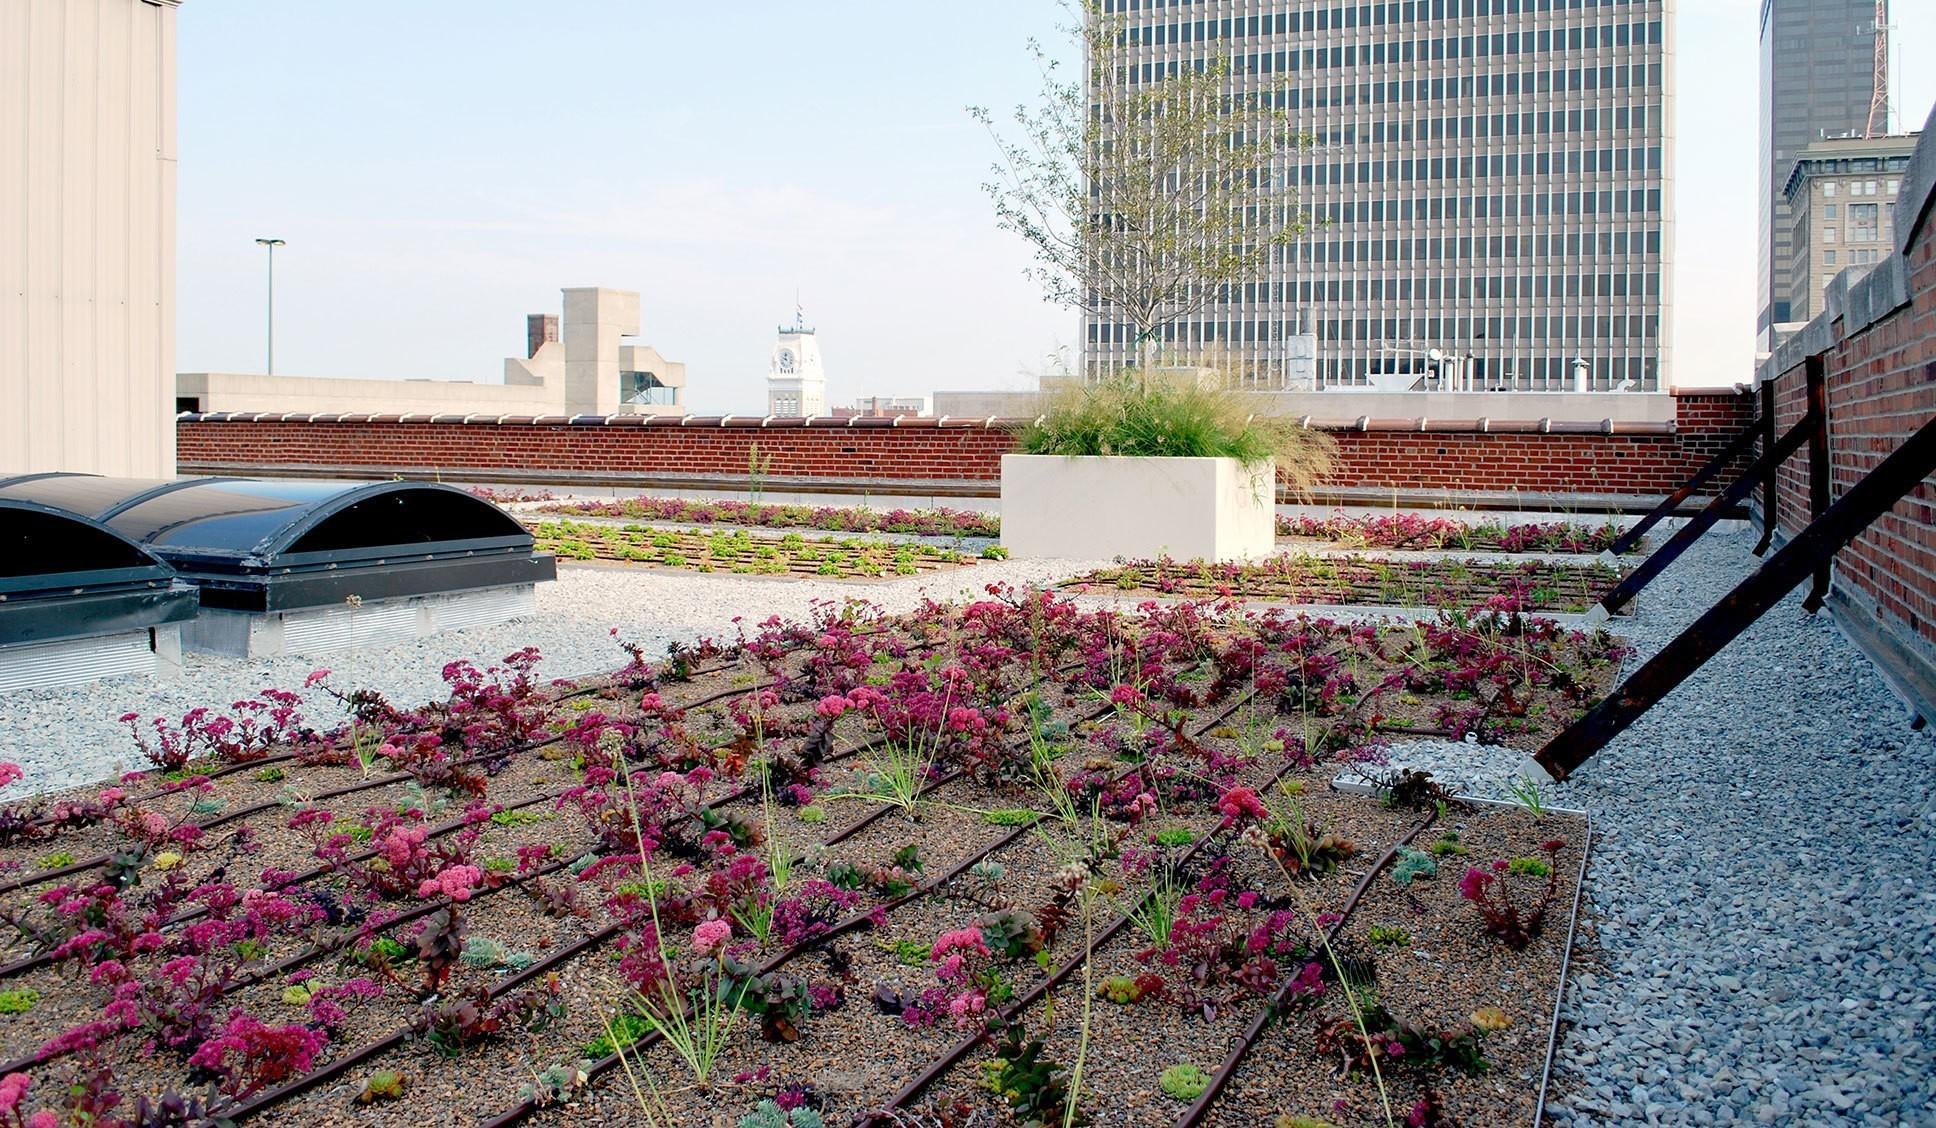 louisville-metro-government-metro-development-center-green-roof-garden